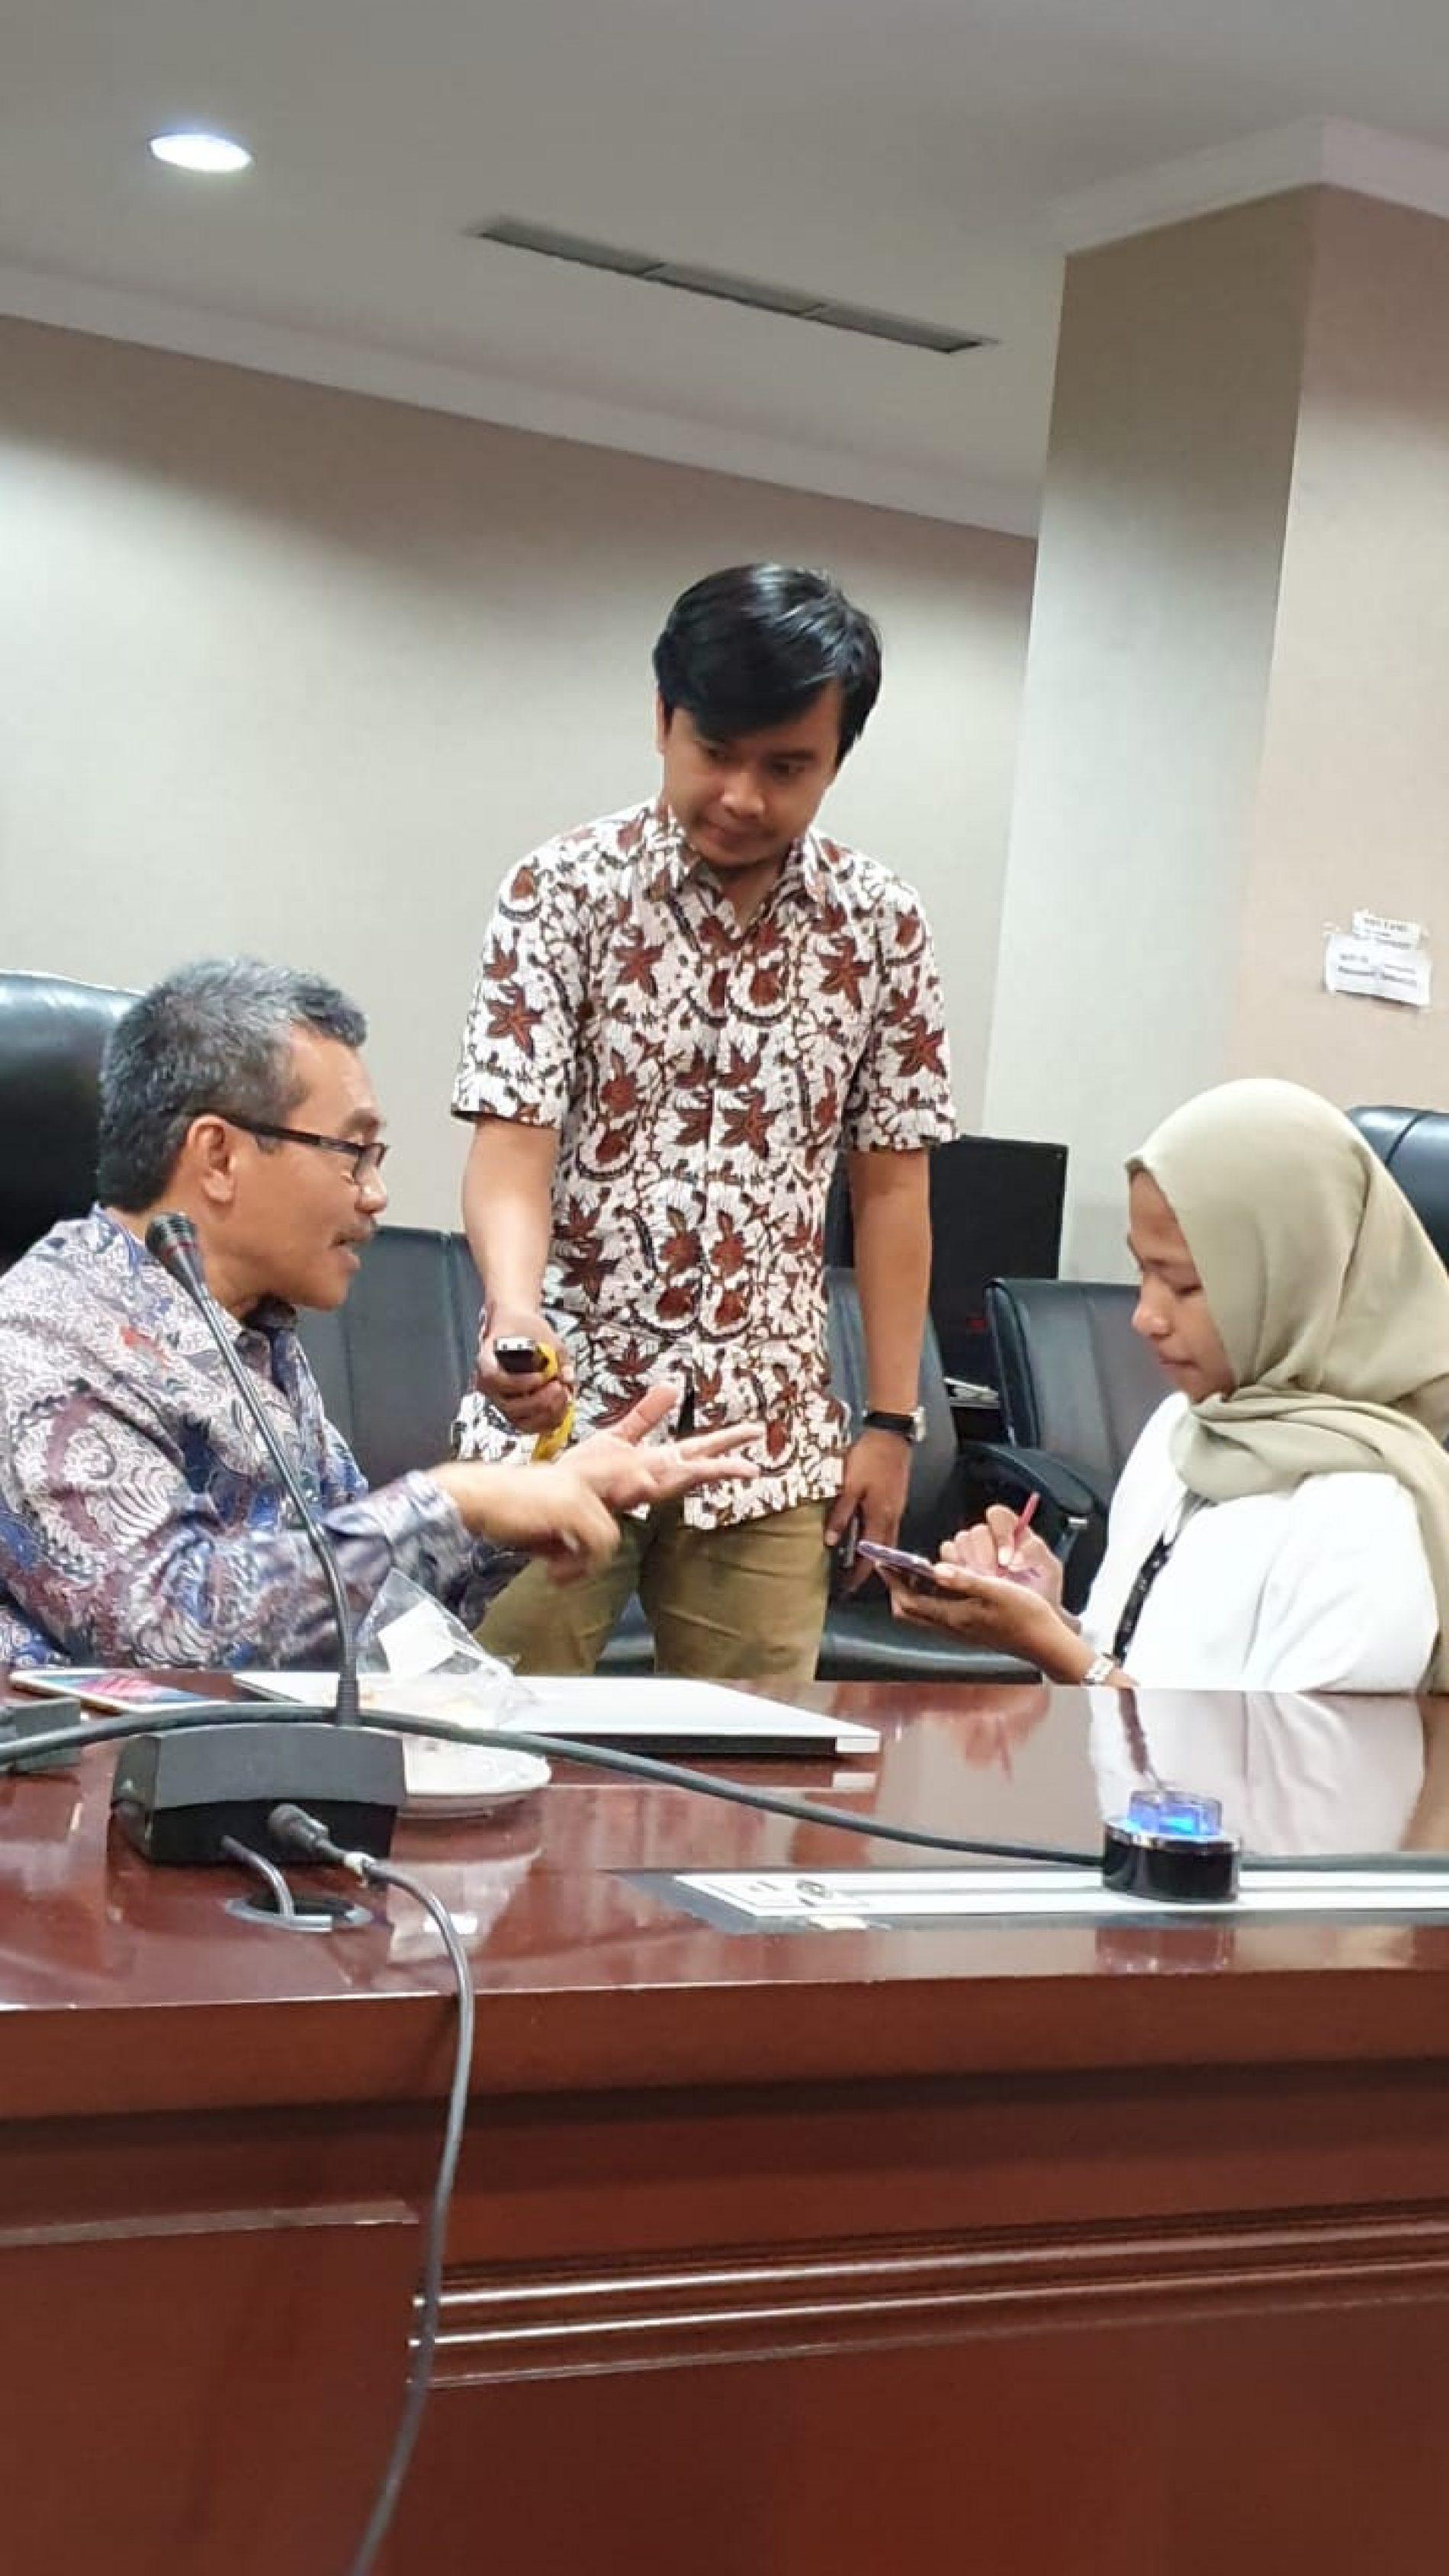 Wawancara Oleh Wartawan di Kantor Staf Kepresidenan